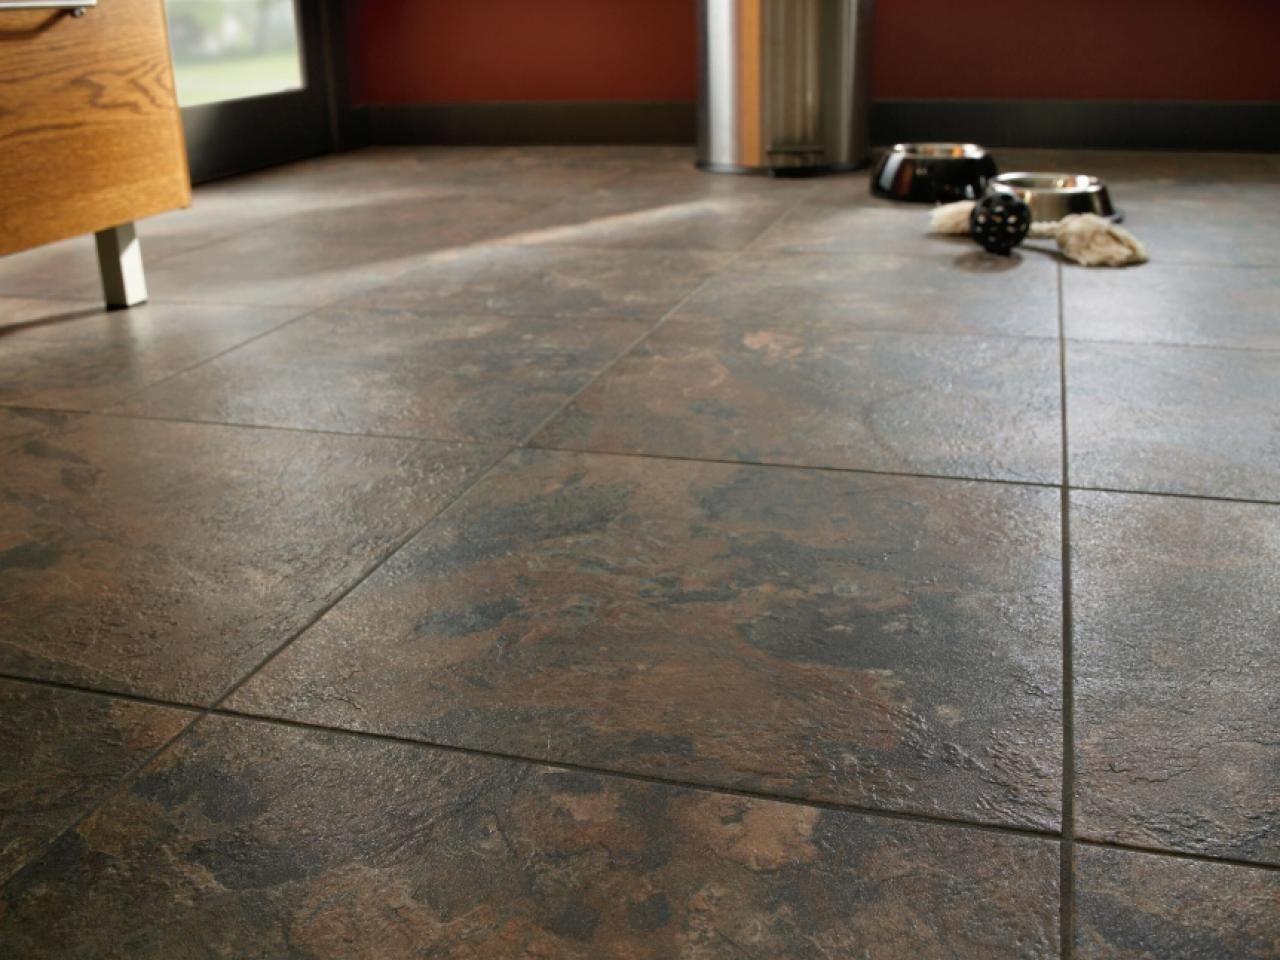 Vinyl Flooring Tiles That Look Like Stone Flooring Tile Floor Vinyl Flooring